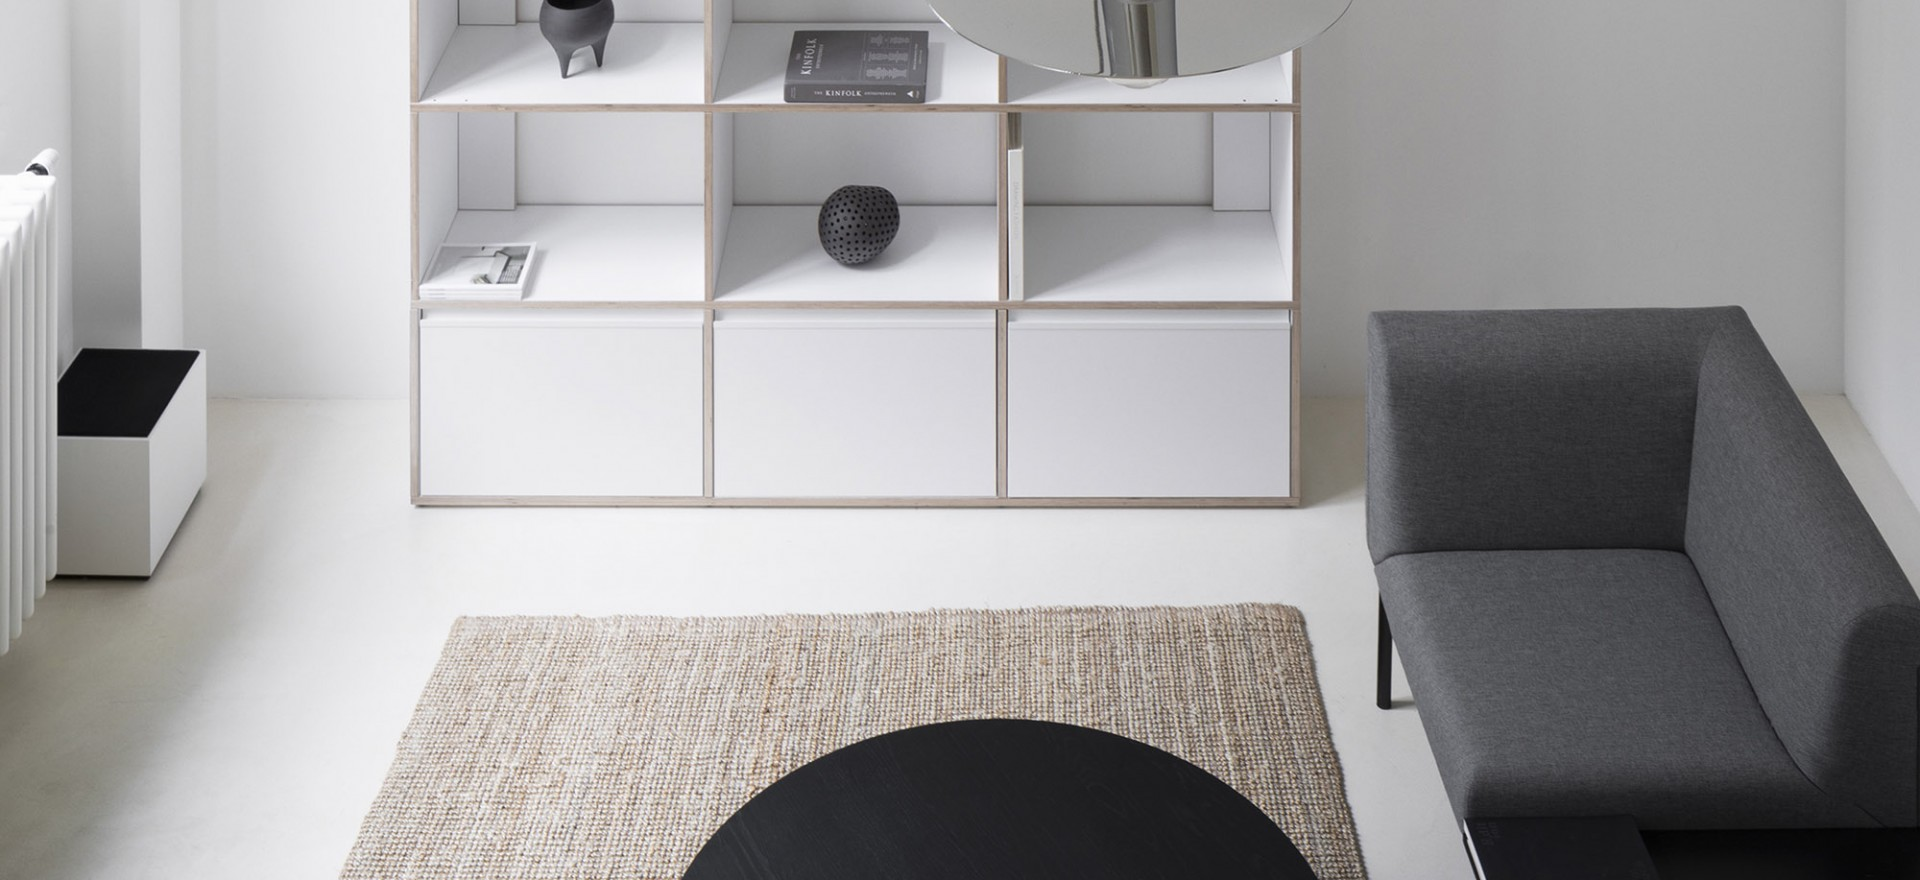 thisispaper_aplace_apartment_interior_design_warsaw_berlin_maja_wirkus_photography_10 copy 1